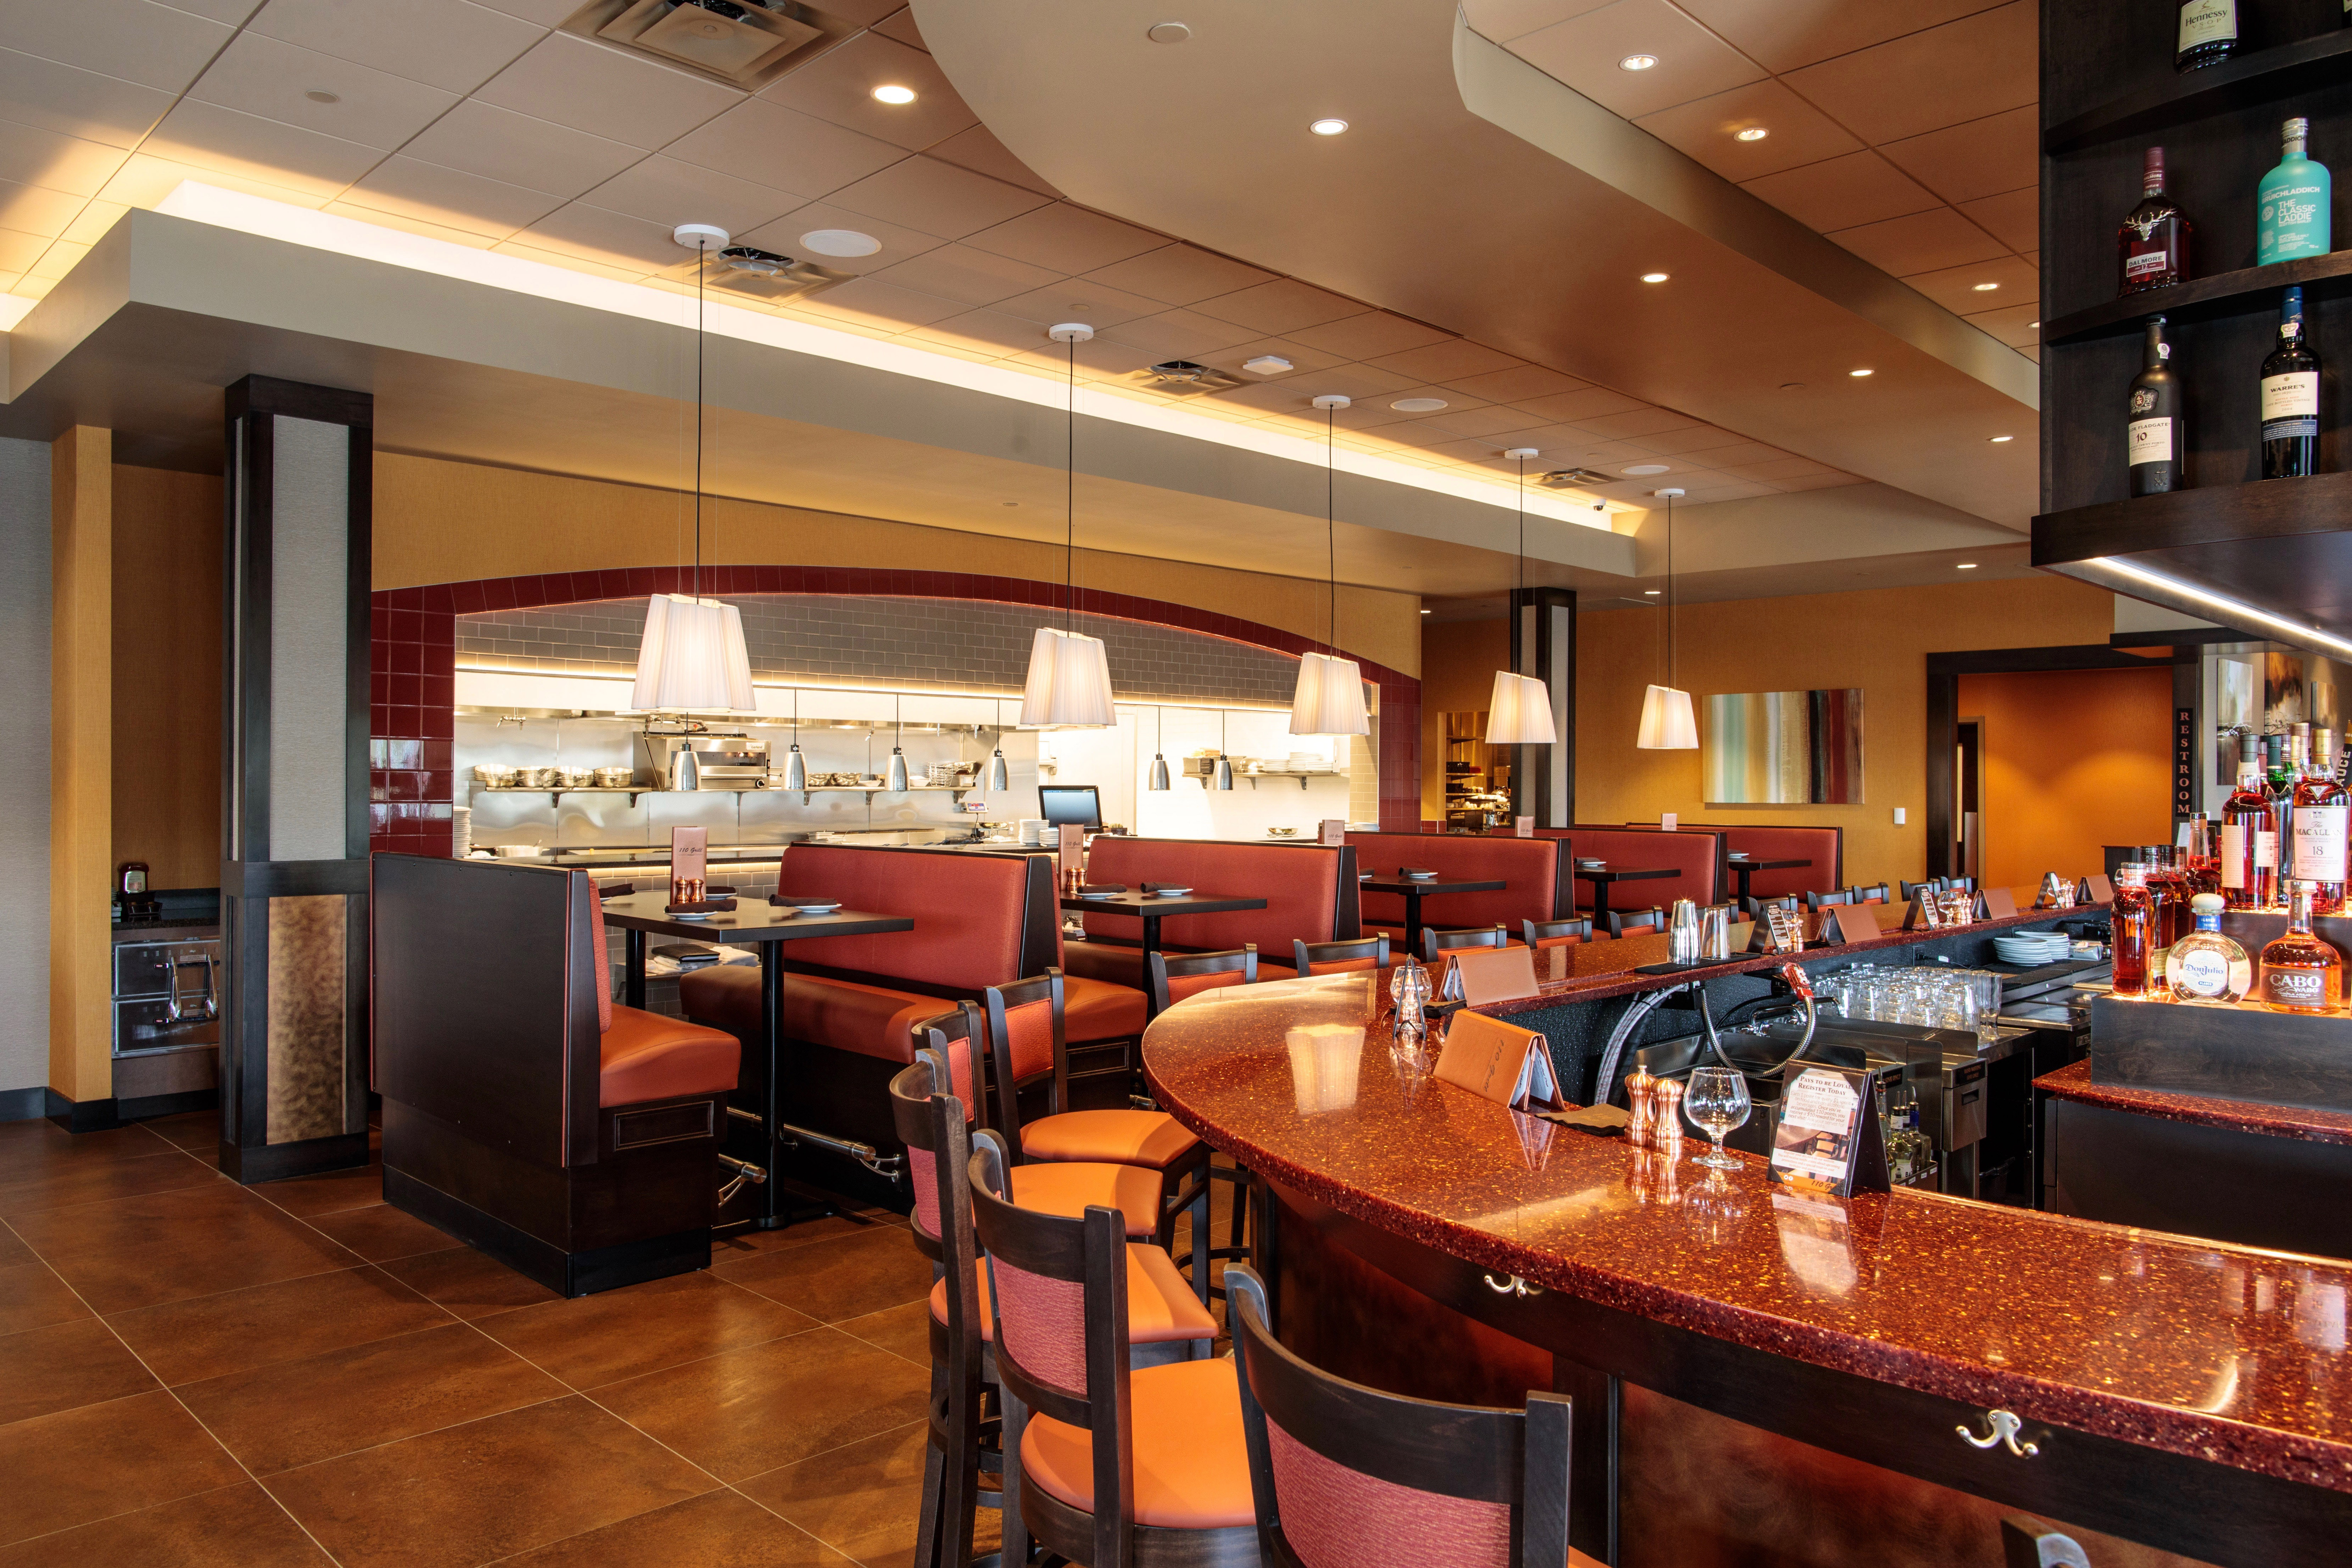 Fall River, MA - 5 Grill - Modern American Restaurant